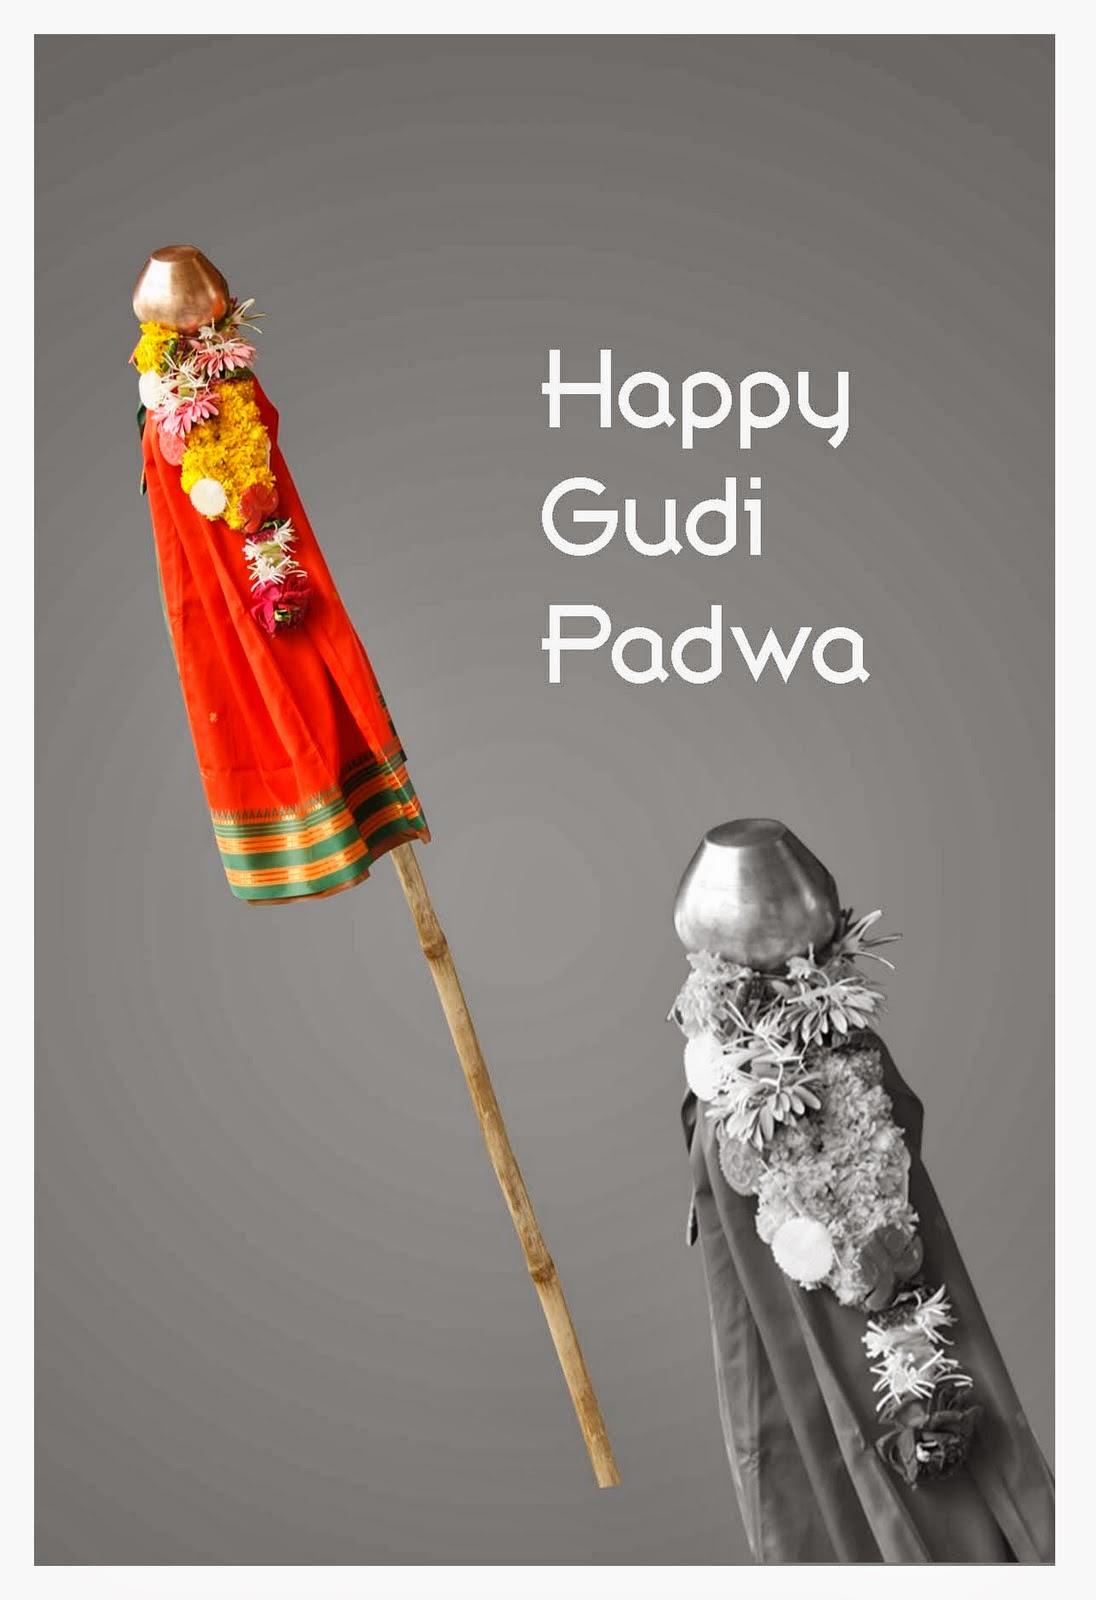 gudi padwa The marathi gudi padwa wishes include whatsapp greetings, facebook status,  sms and also gif images & photos happy gudi padwa.